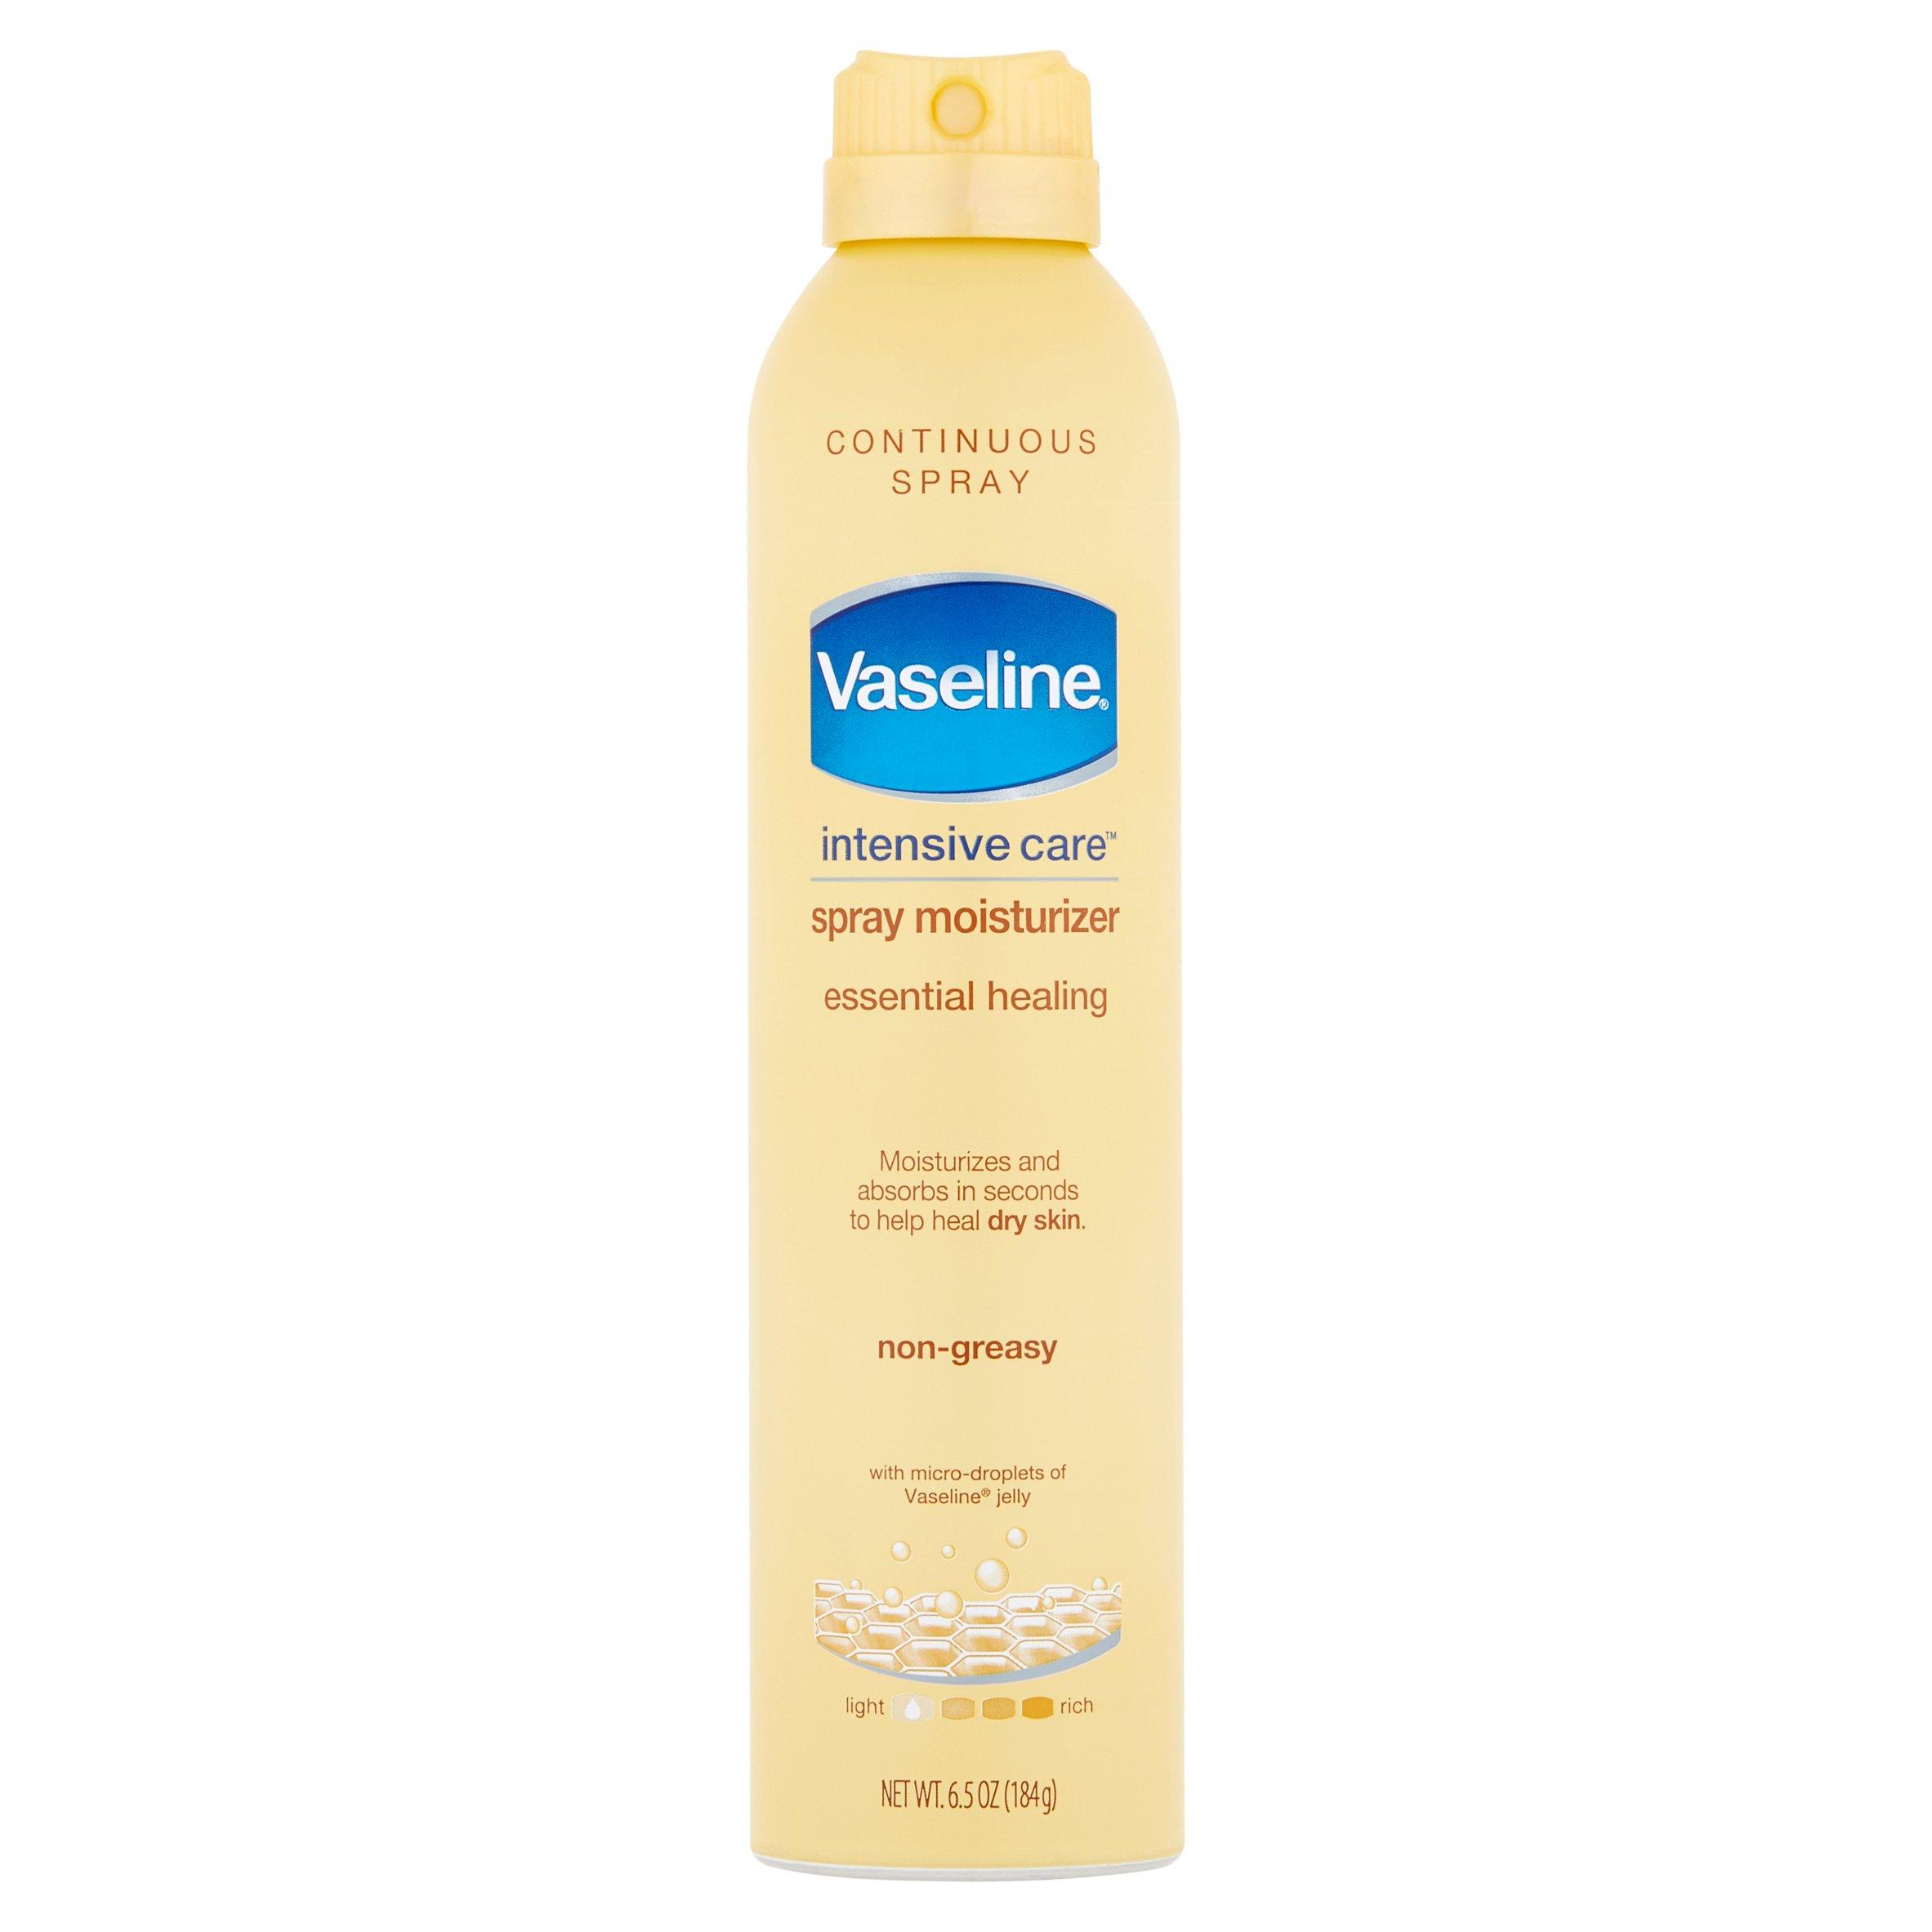 Vaseline Intensive Care Essential Healing Non-Greasy Spray Moisturizer, 6.5 oz